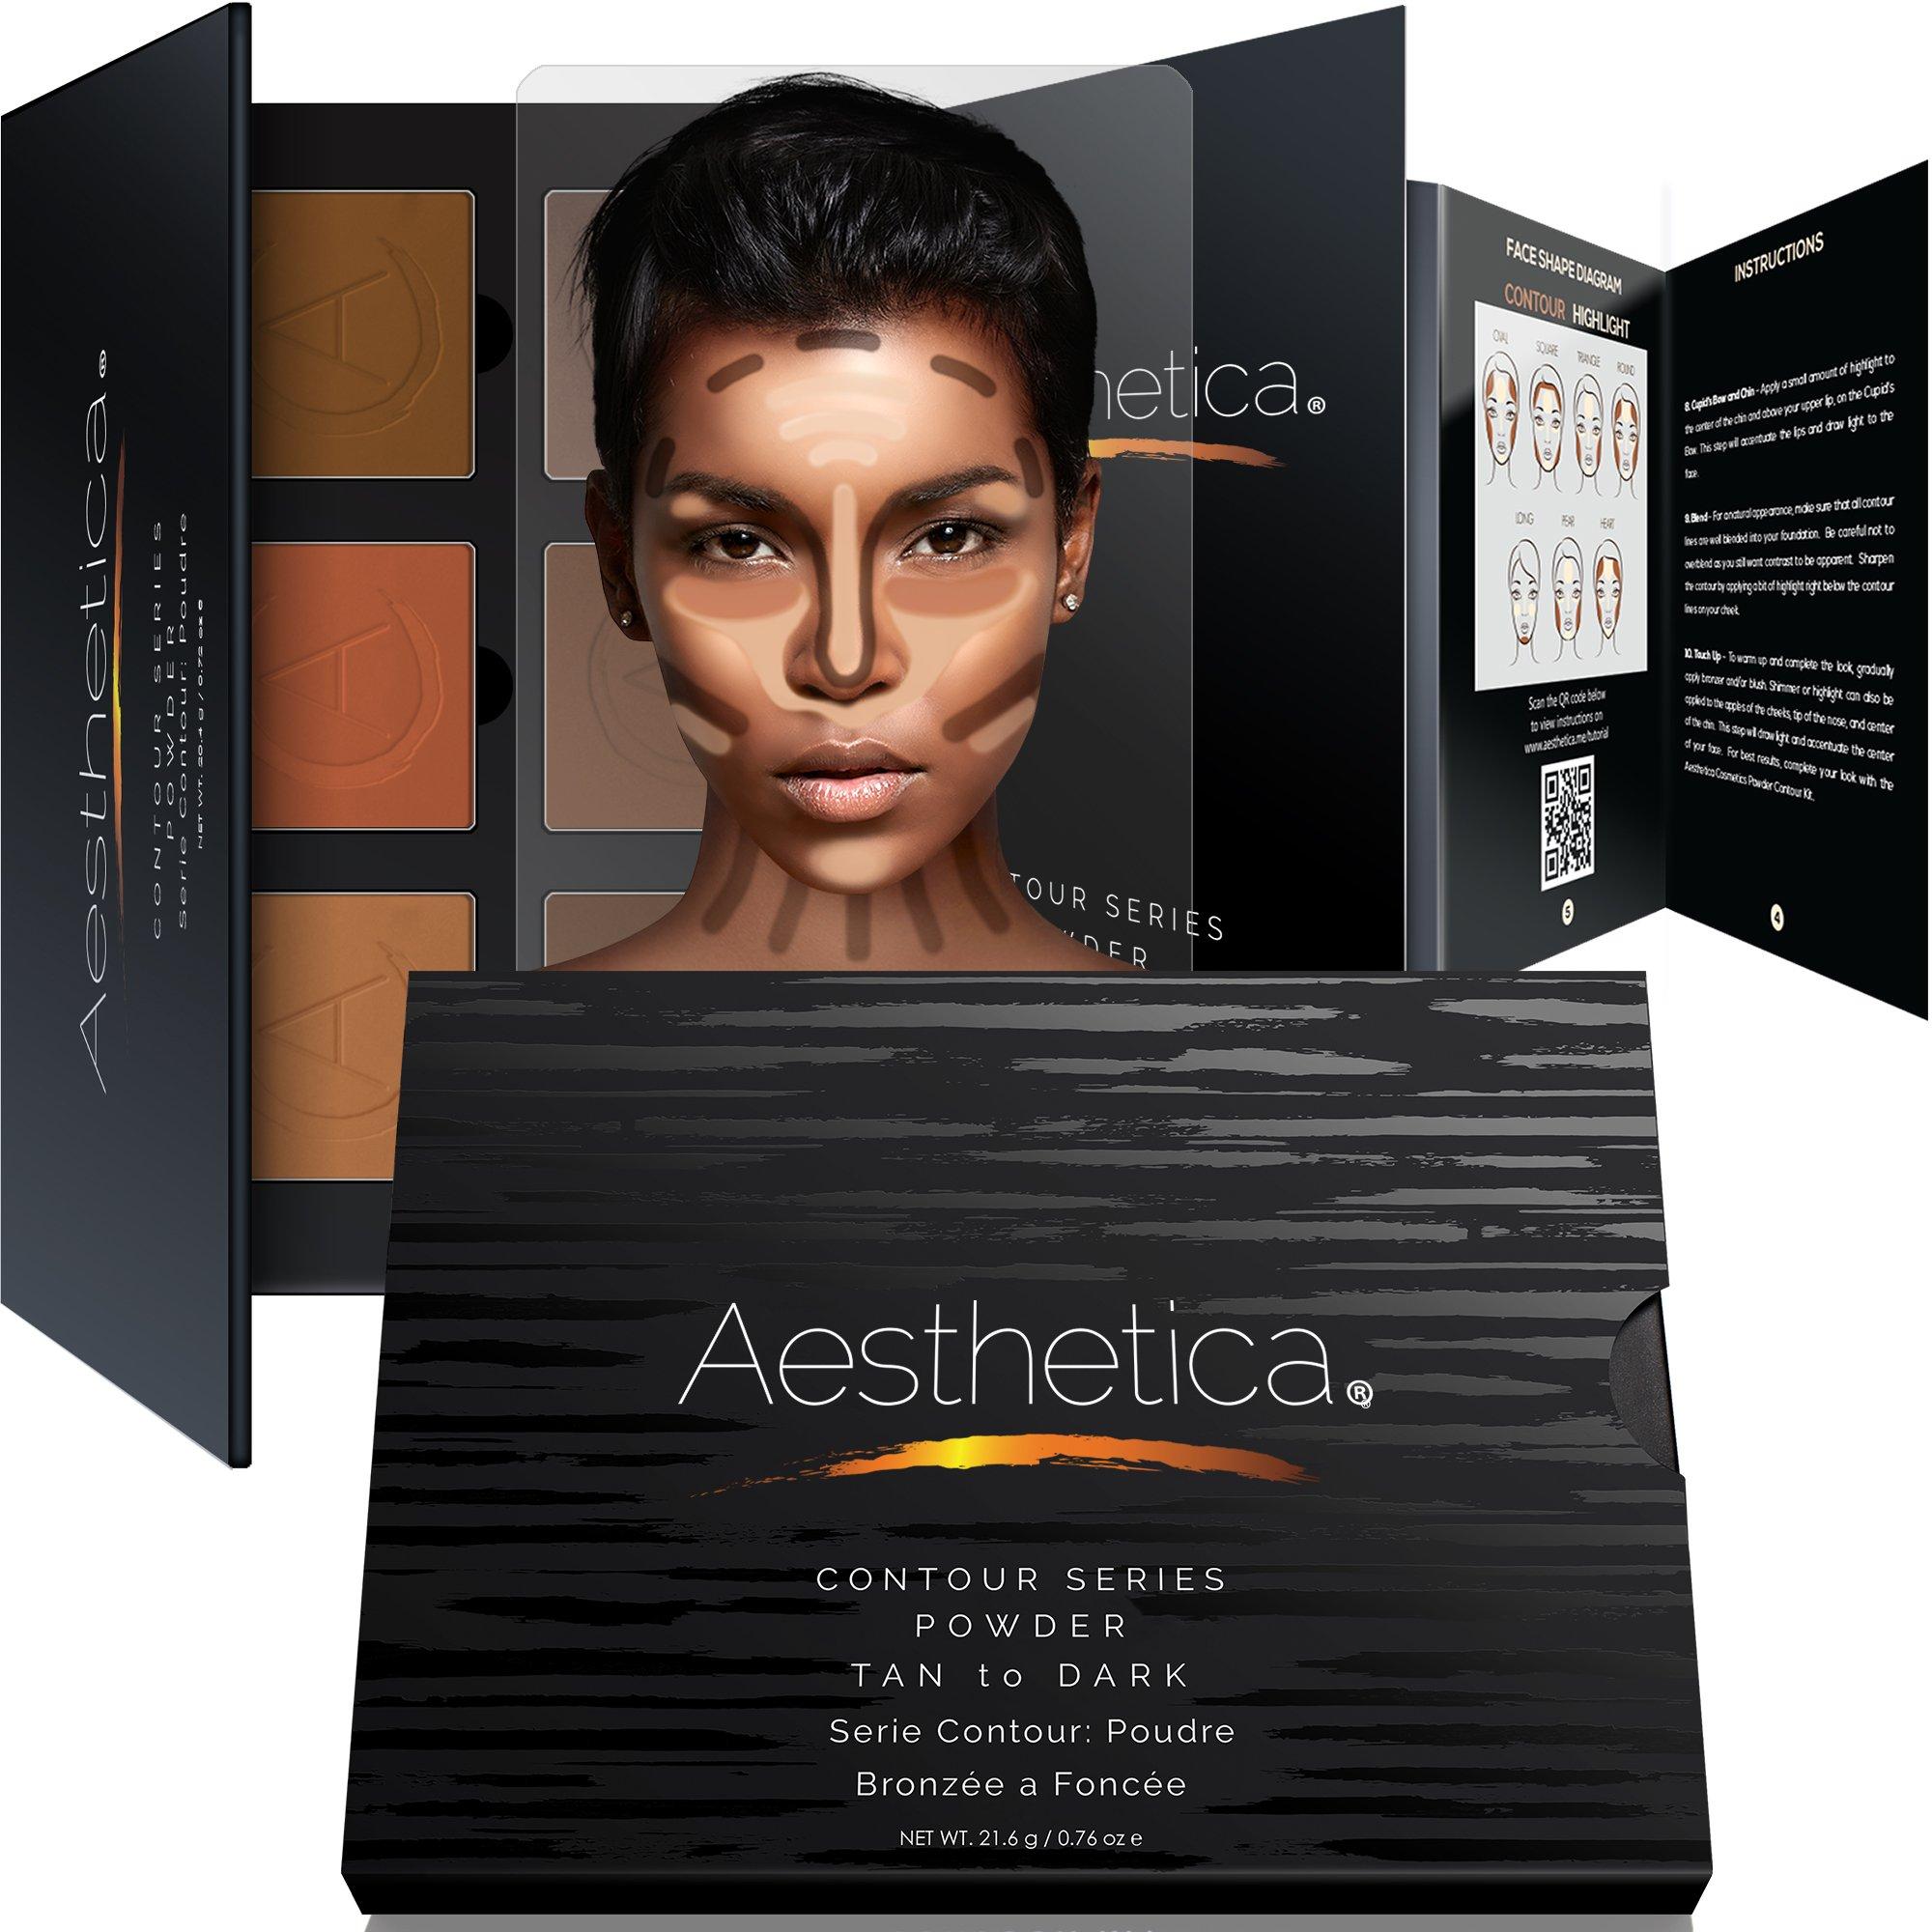 Aesthetica Cosmetics Contour Kit - Powder Contour, Highlighter & Bronzer - Tan to Deep Skin Tones